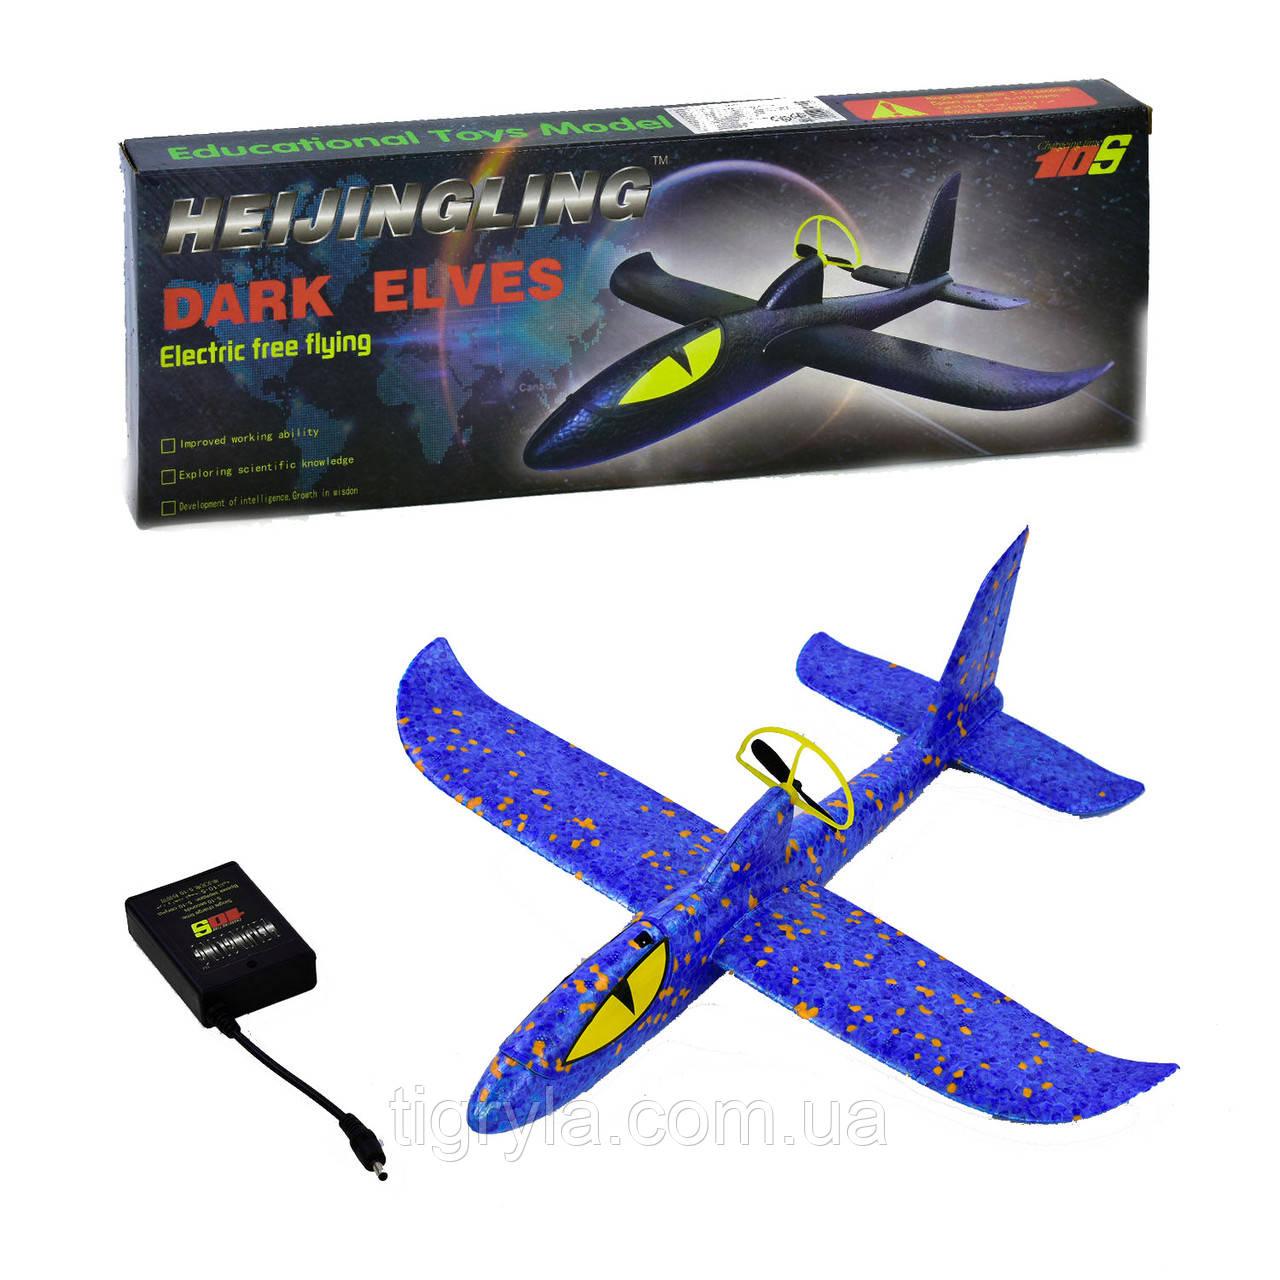 Самолёт планер с электромотором